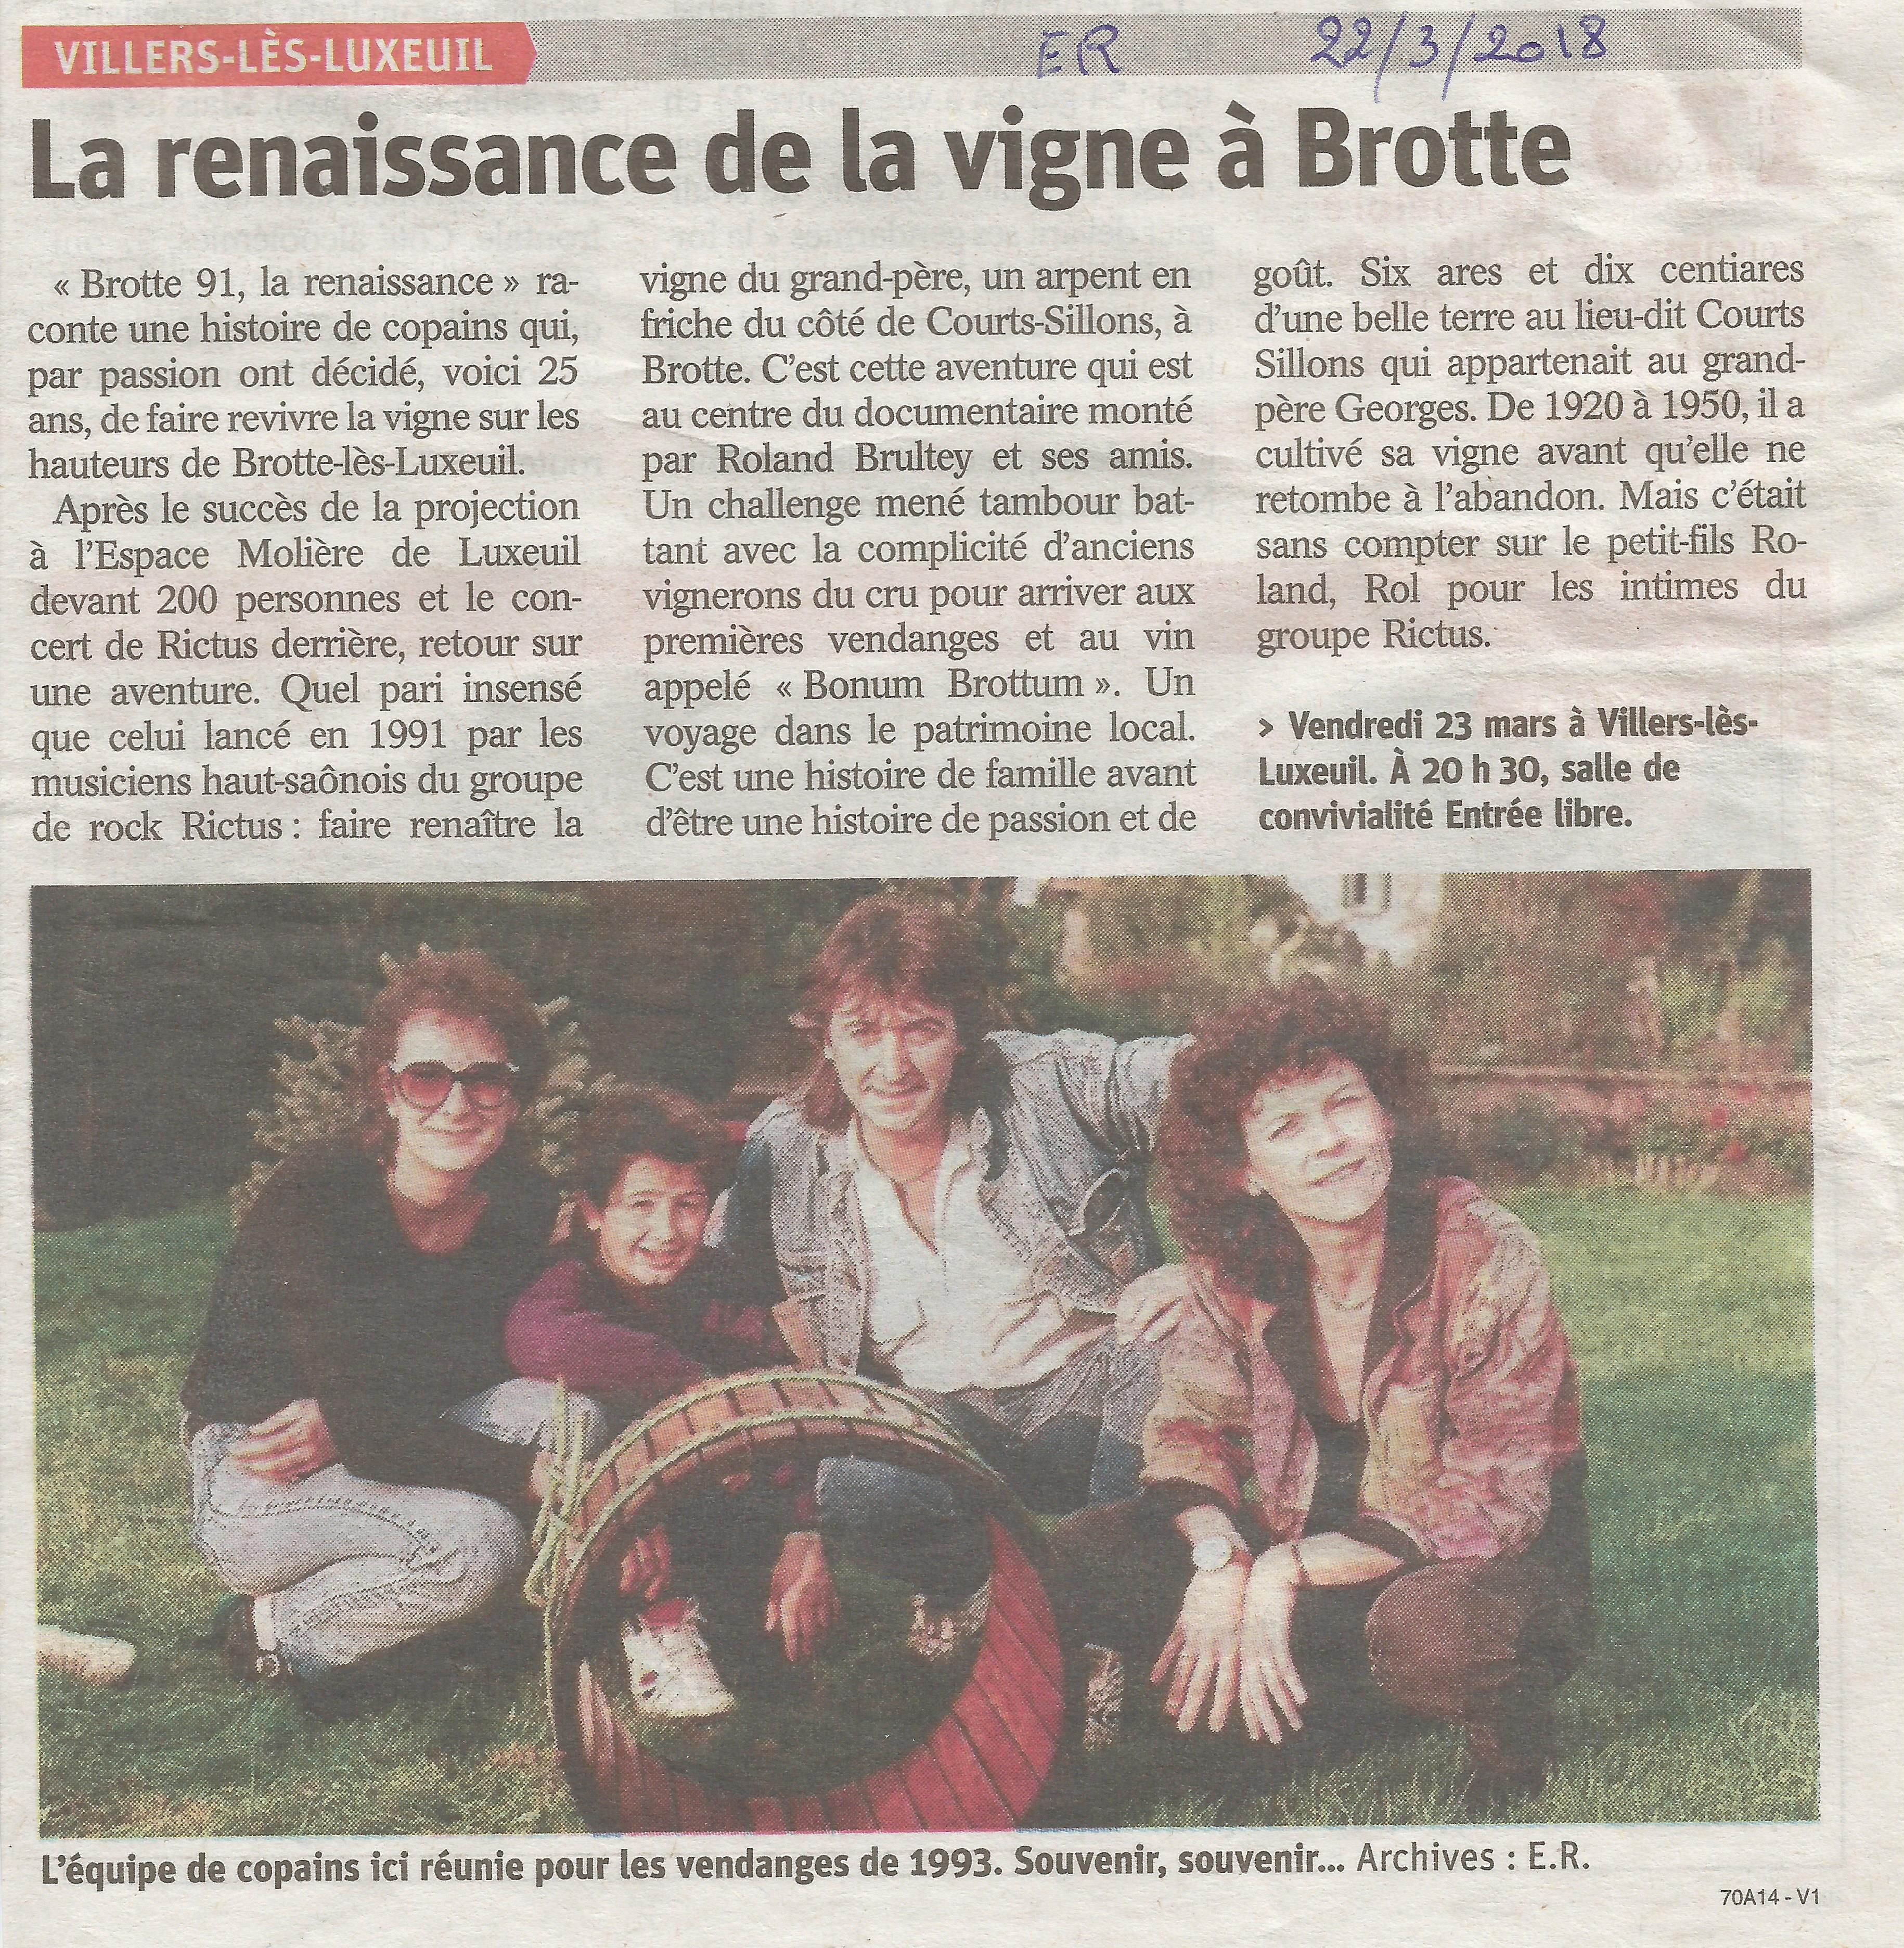 https://www.villers-les-luxeuil.com/projets/villers/files/images/2018_Mairie/Presse/2018_03_22.jpg